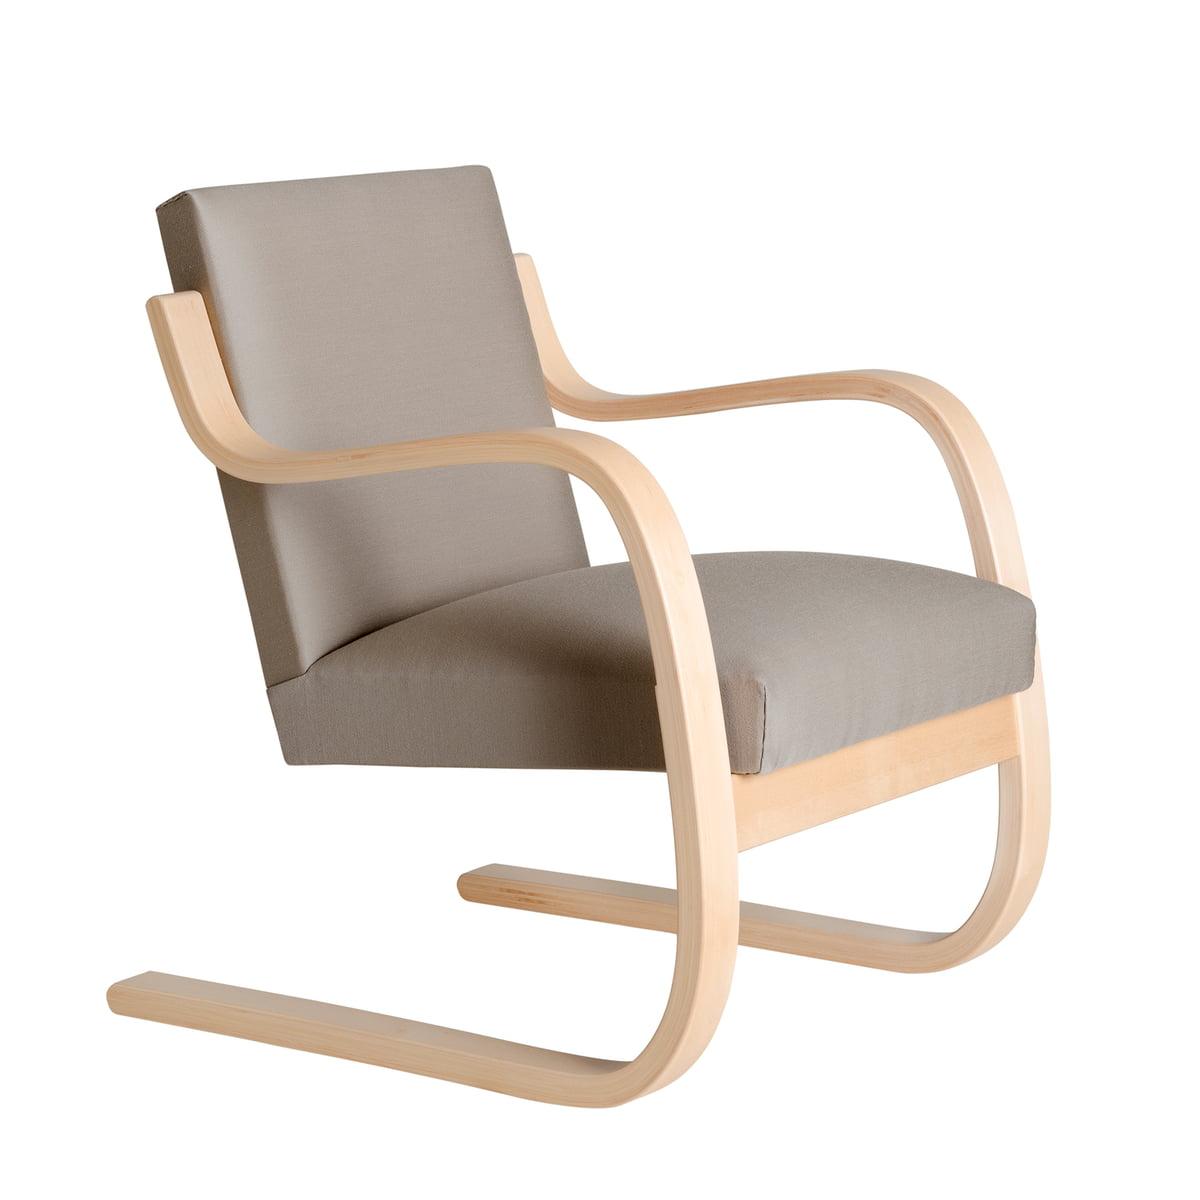 Sessel 402 Von Artek Connox